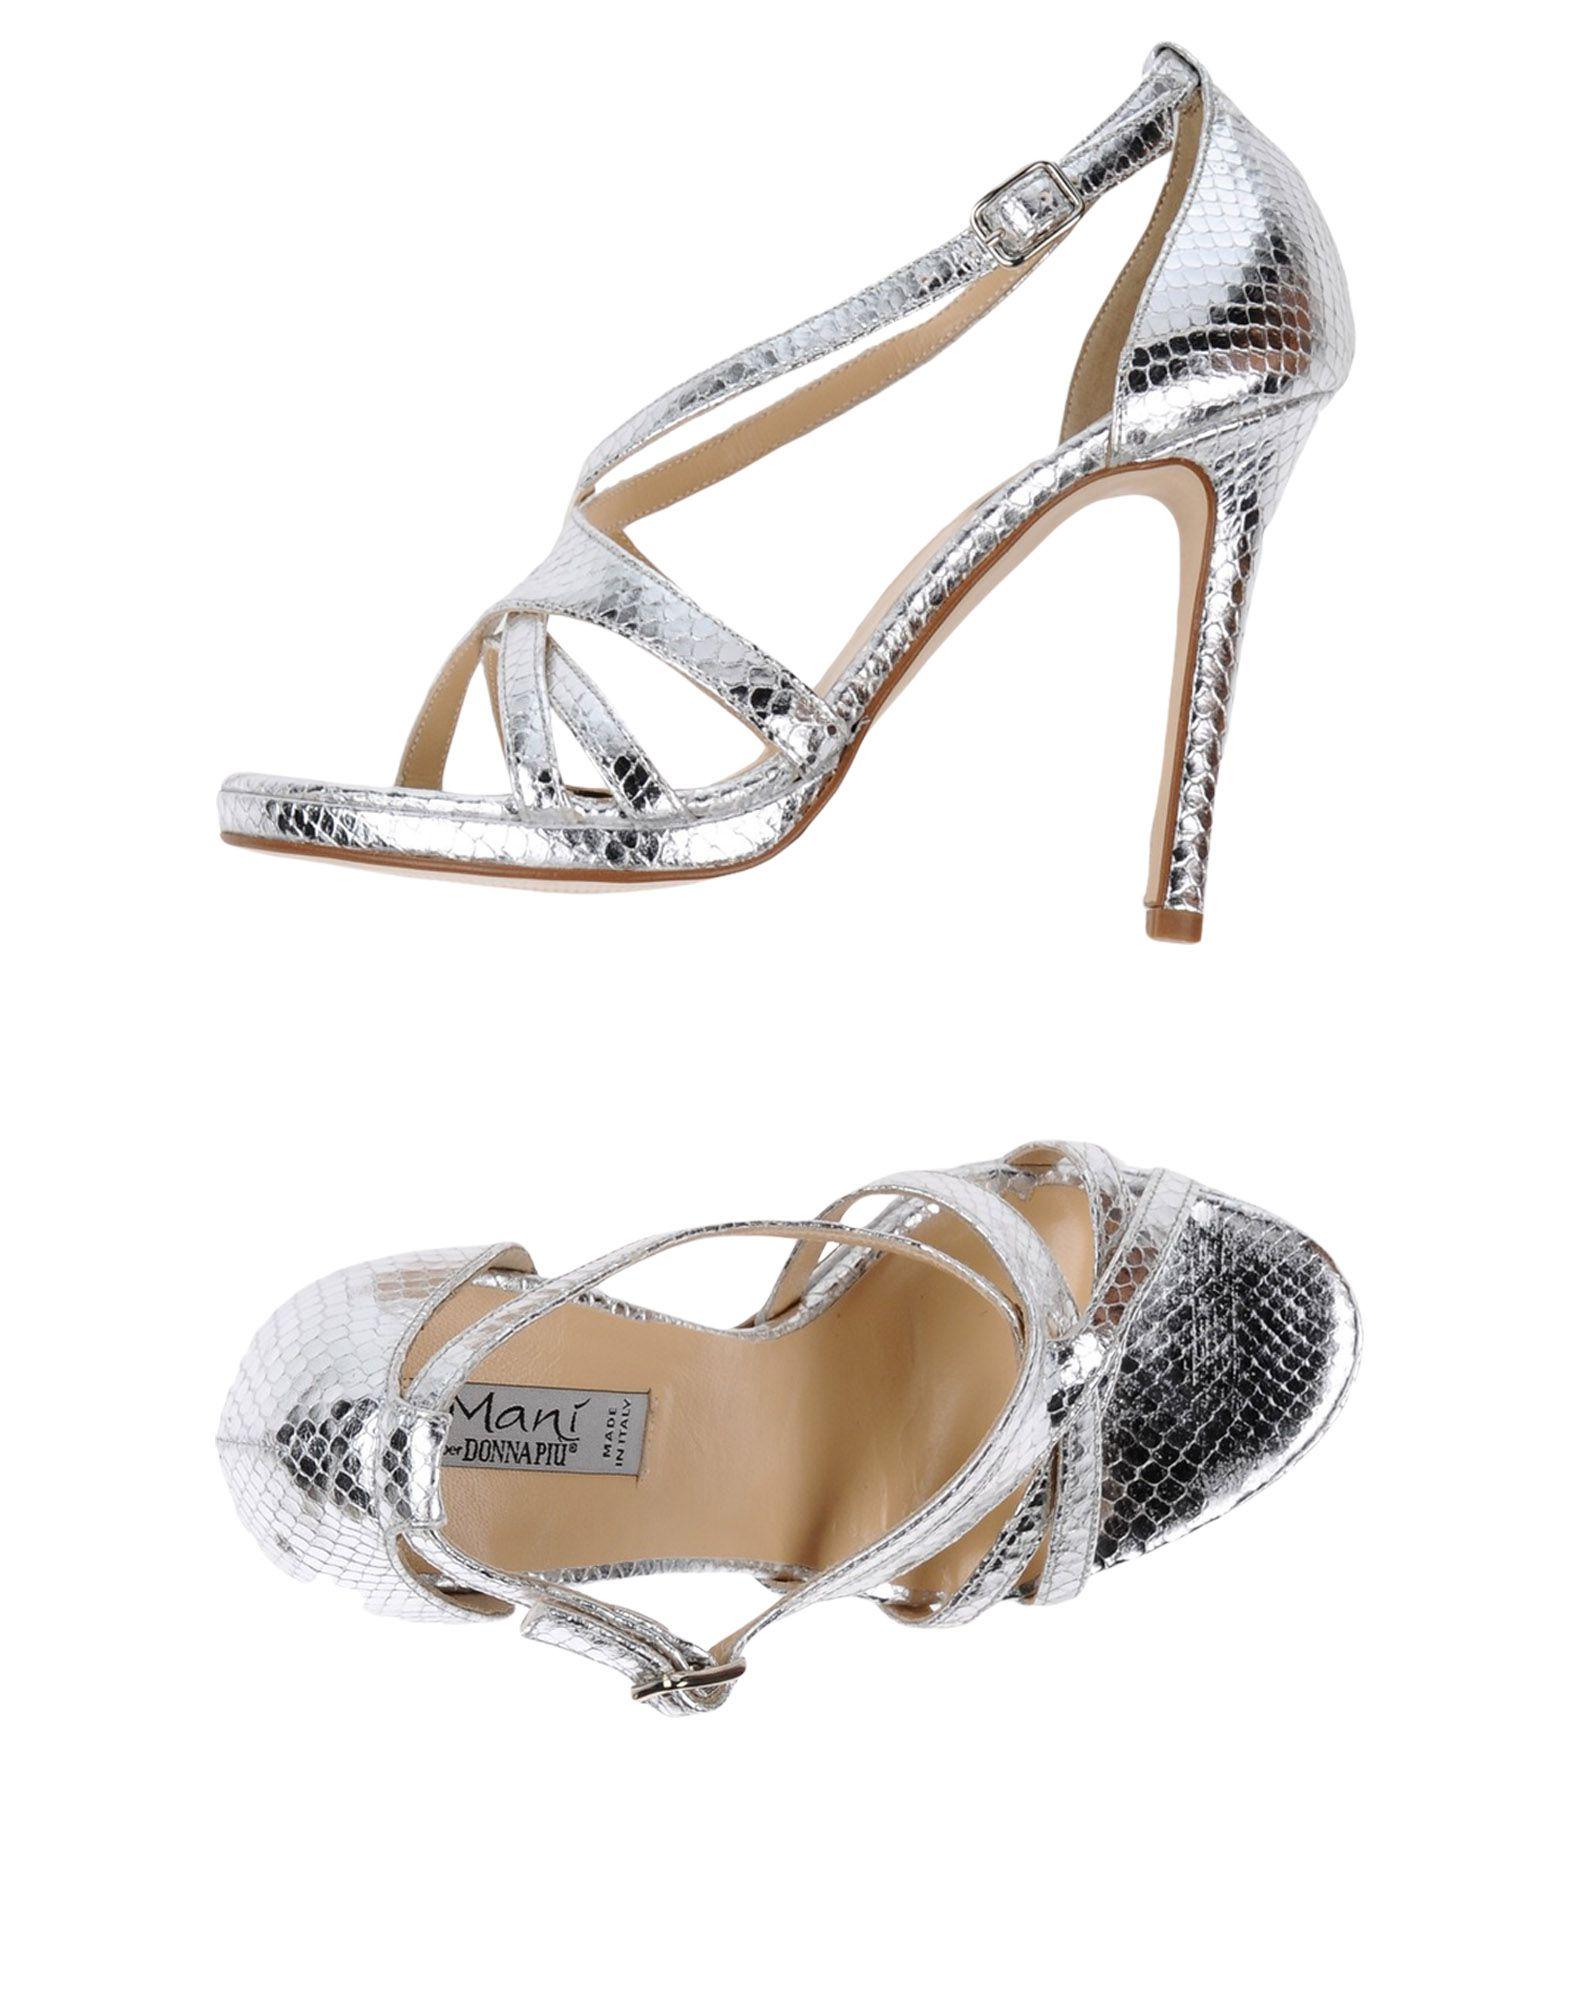 MANÌ per DONNA PIÙ Сандалии donna più обувь на шнурках